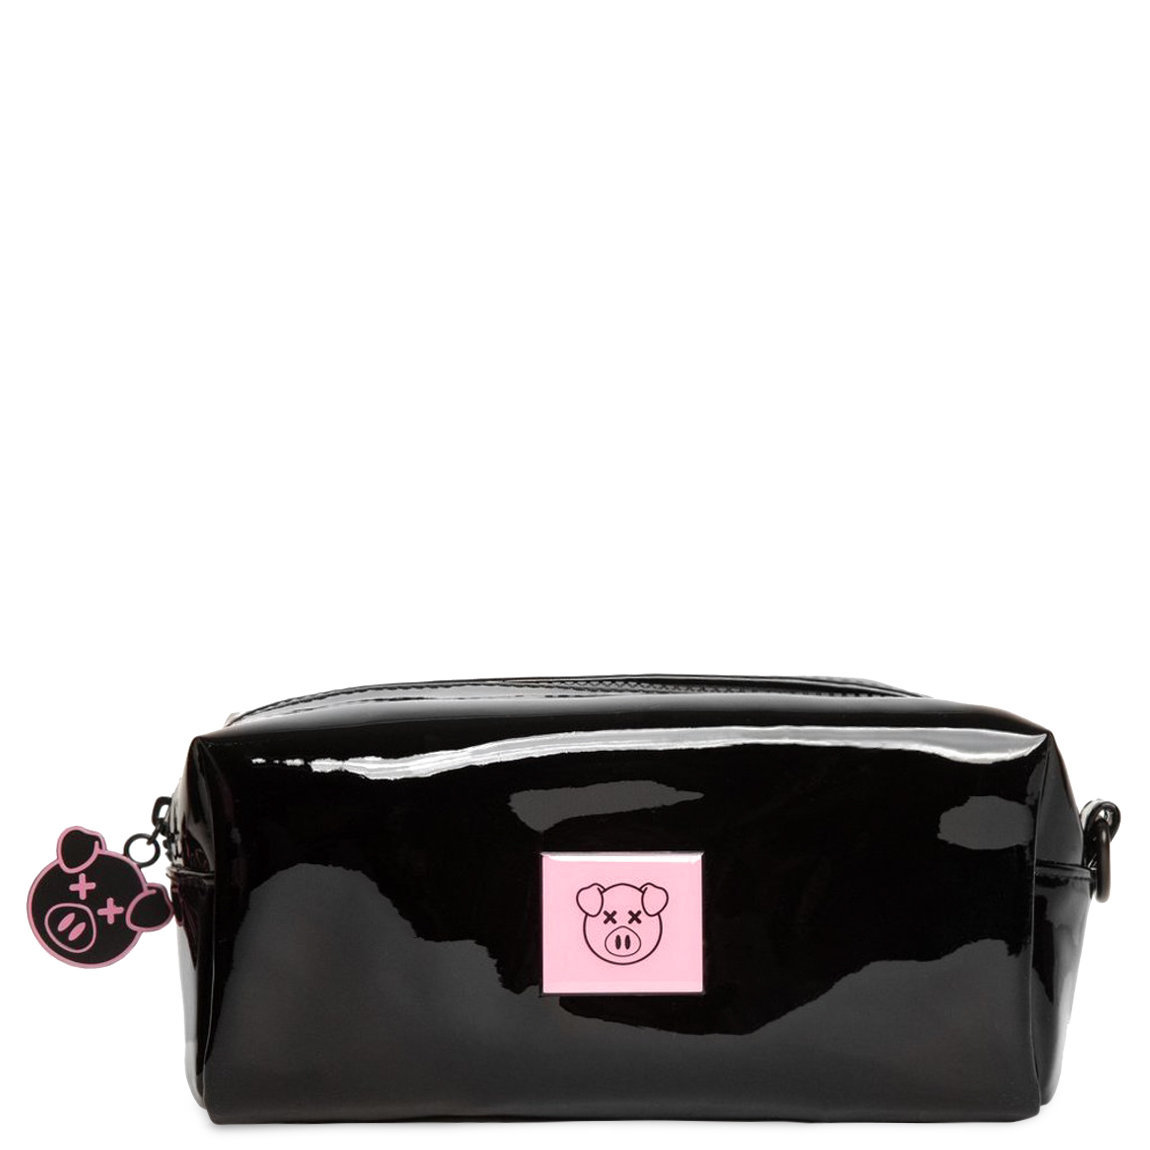 Jeffree Star Cosmetics Shane Dawson Accessory Bag alternative view 1 - product swatch.